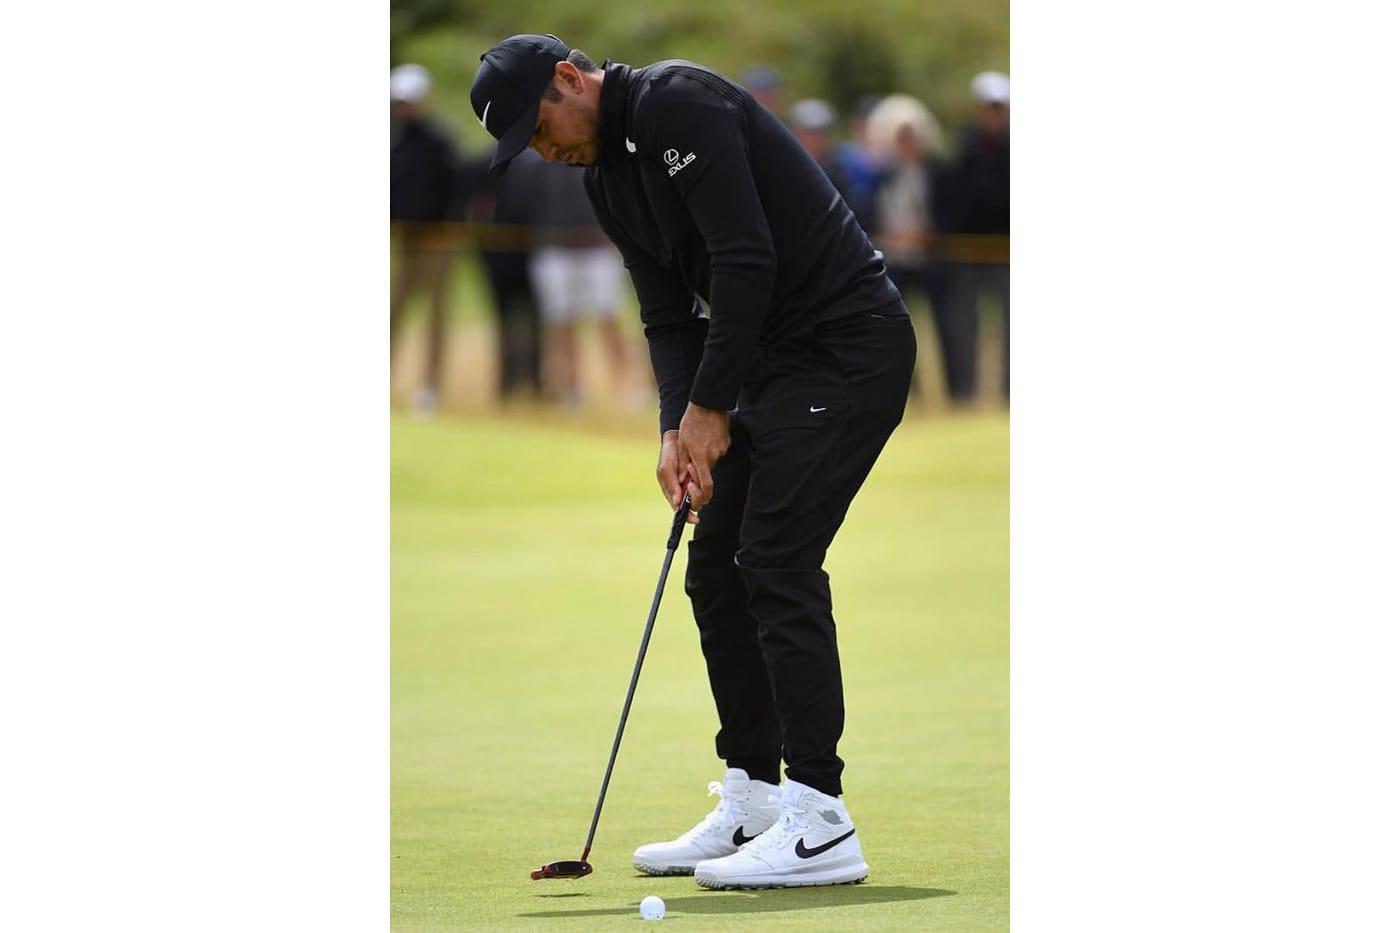 Jason Day Wears Air Jordan 1 at Golf